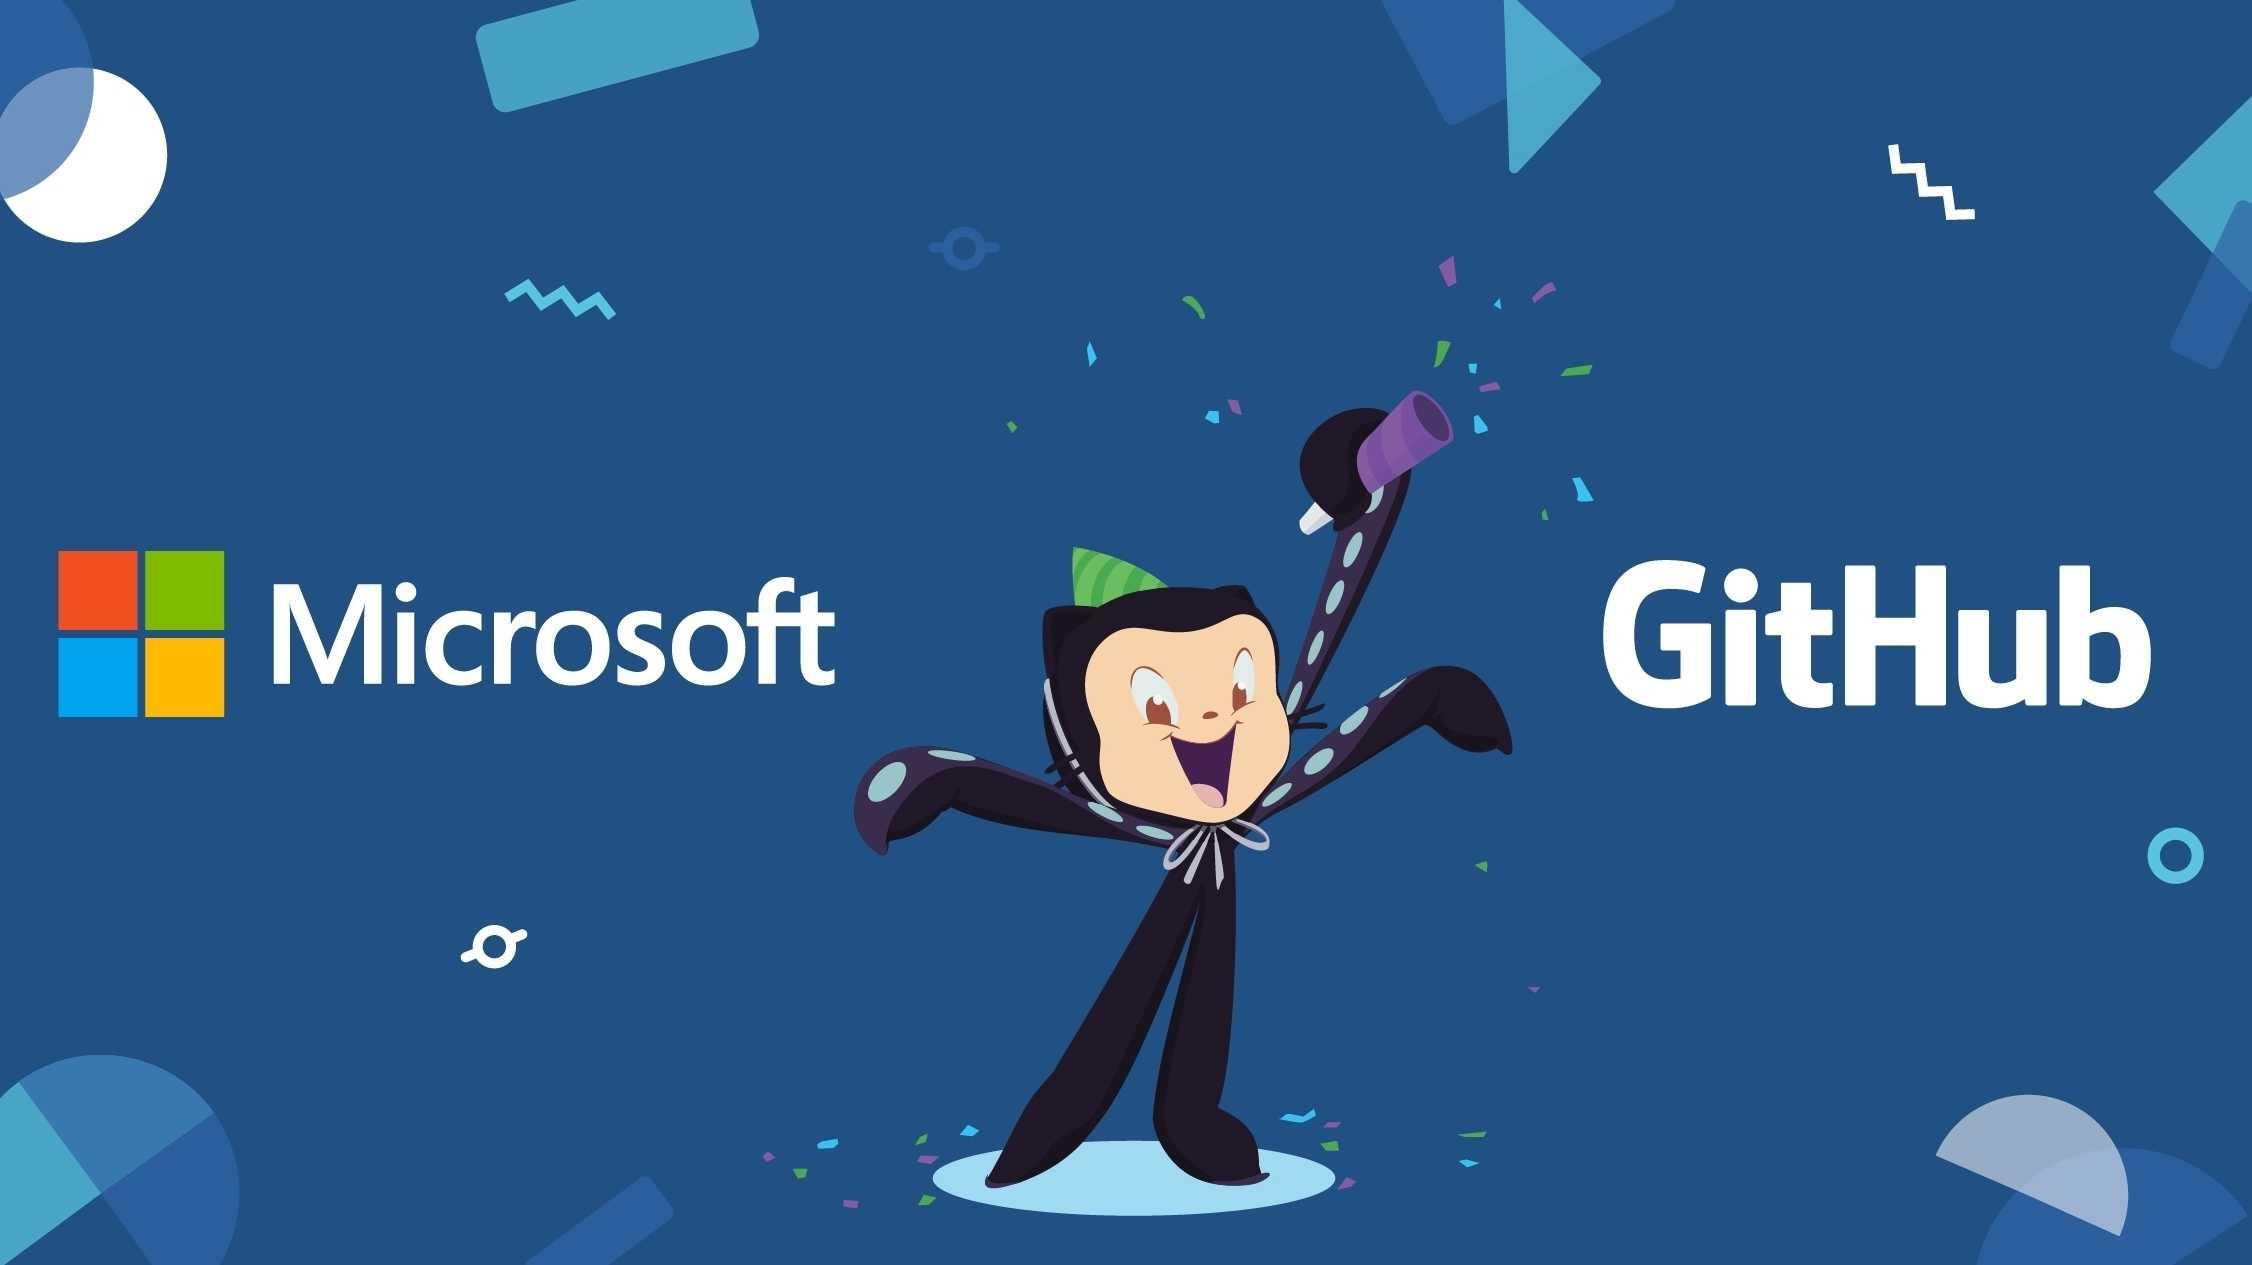 Microsoft kauft GitHub für 7,5 Milliarden US-Dollar